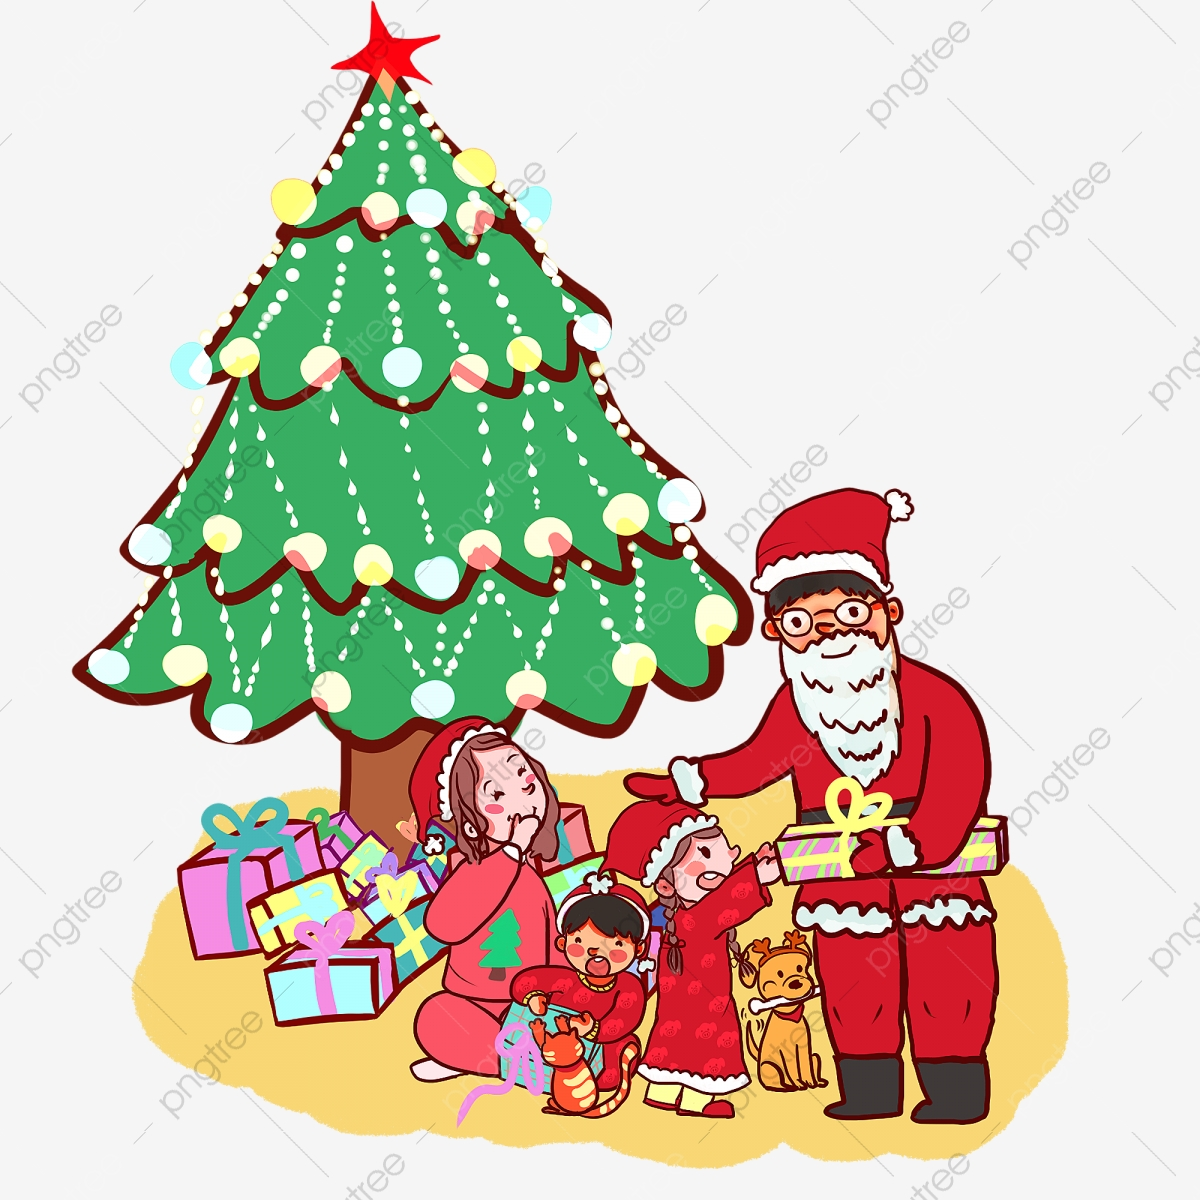 Krismas Tangan Kartun Ditarik Keluarga Yang Hangat Santa